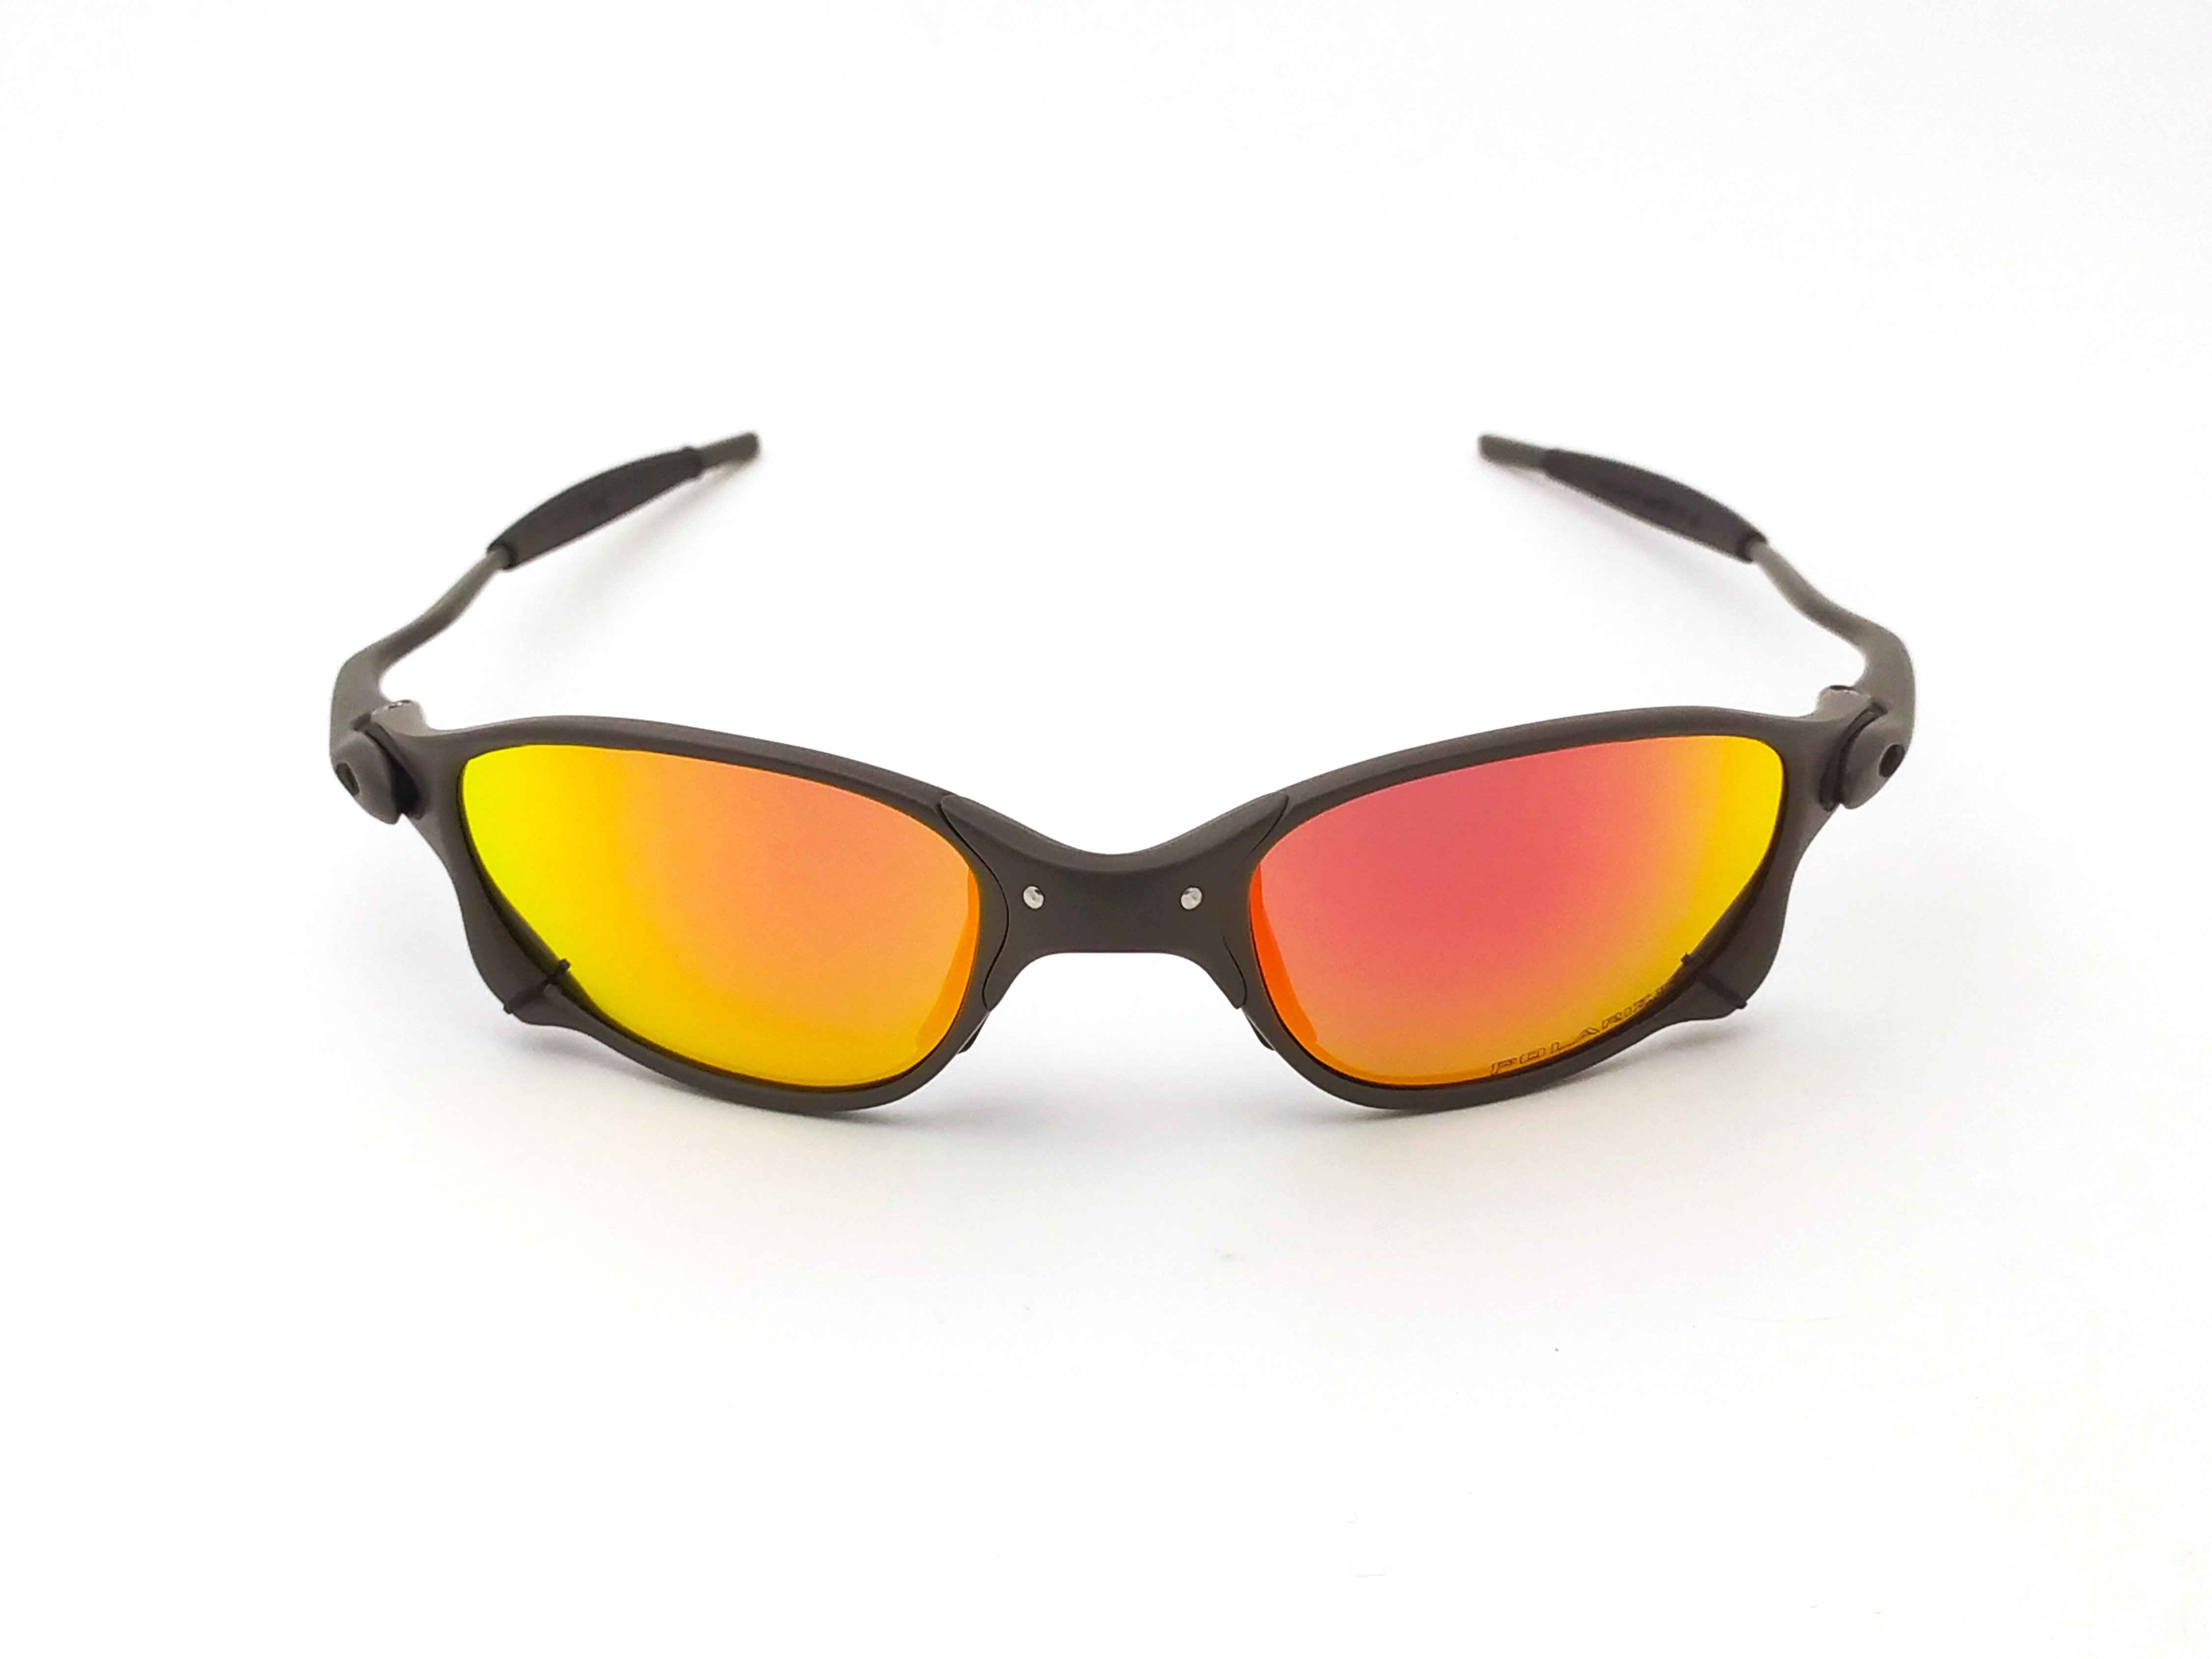 XMetalXXr金属朱丽叶2.0外贸单偏光户外运动摩托车骑行墨镜太阳镜